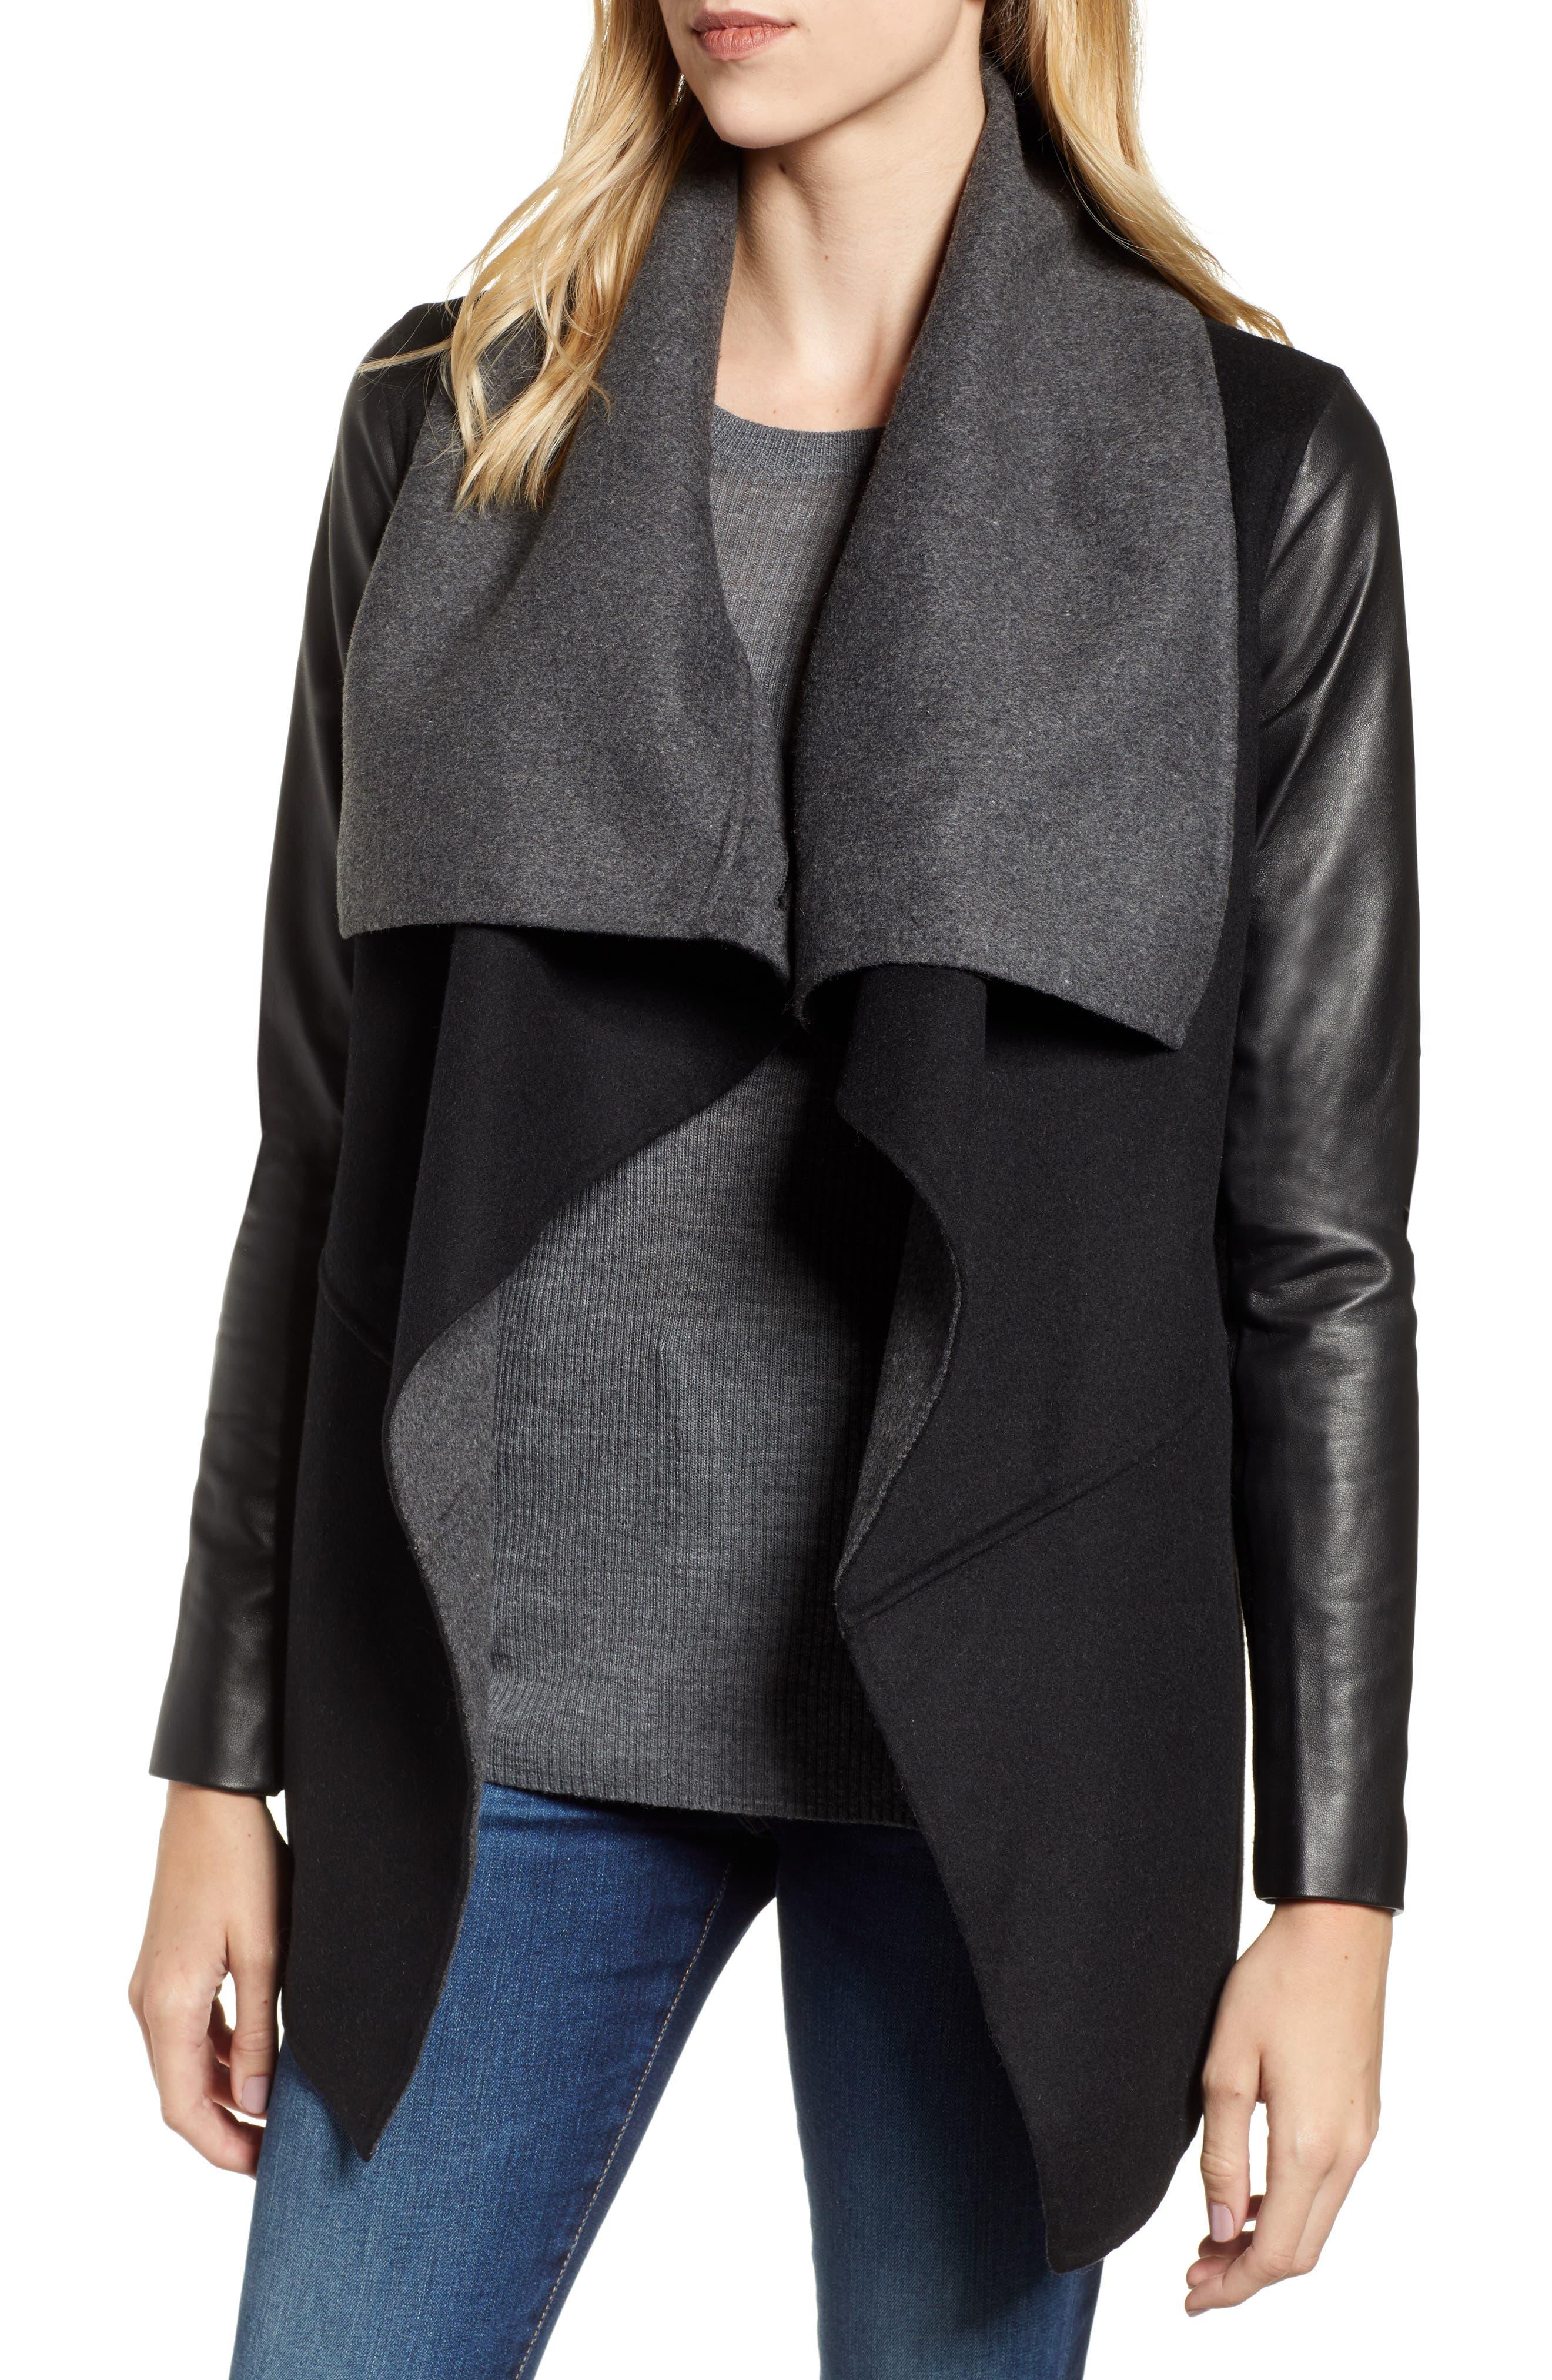 Vane Asymmetrical Leather Sleeve Coat,                             Main thumbnail 1, color,                             BLACK/ CHARCOAL